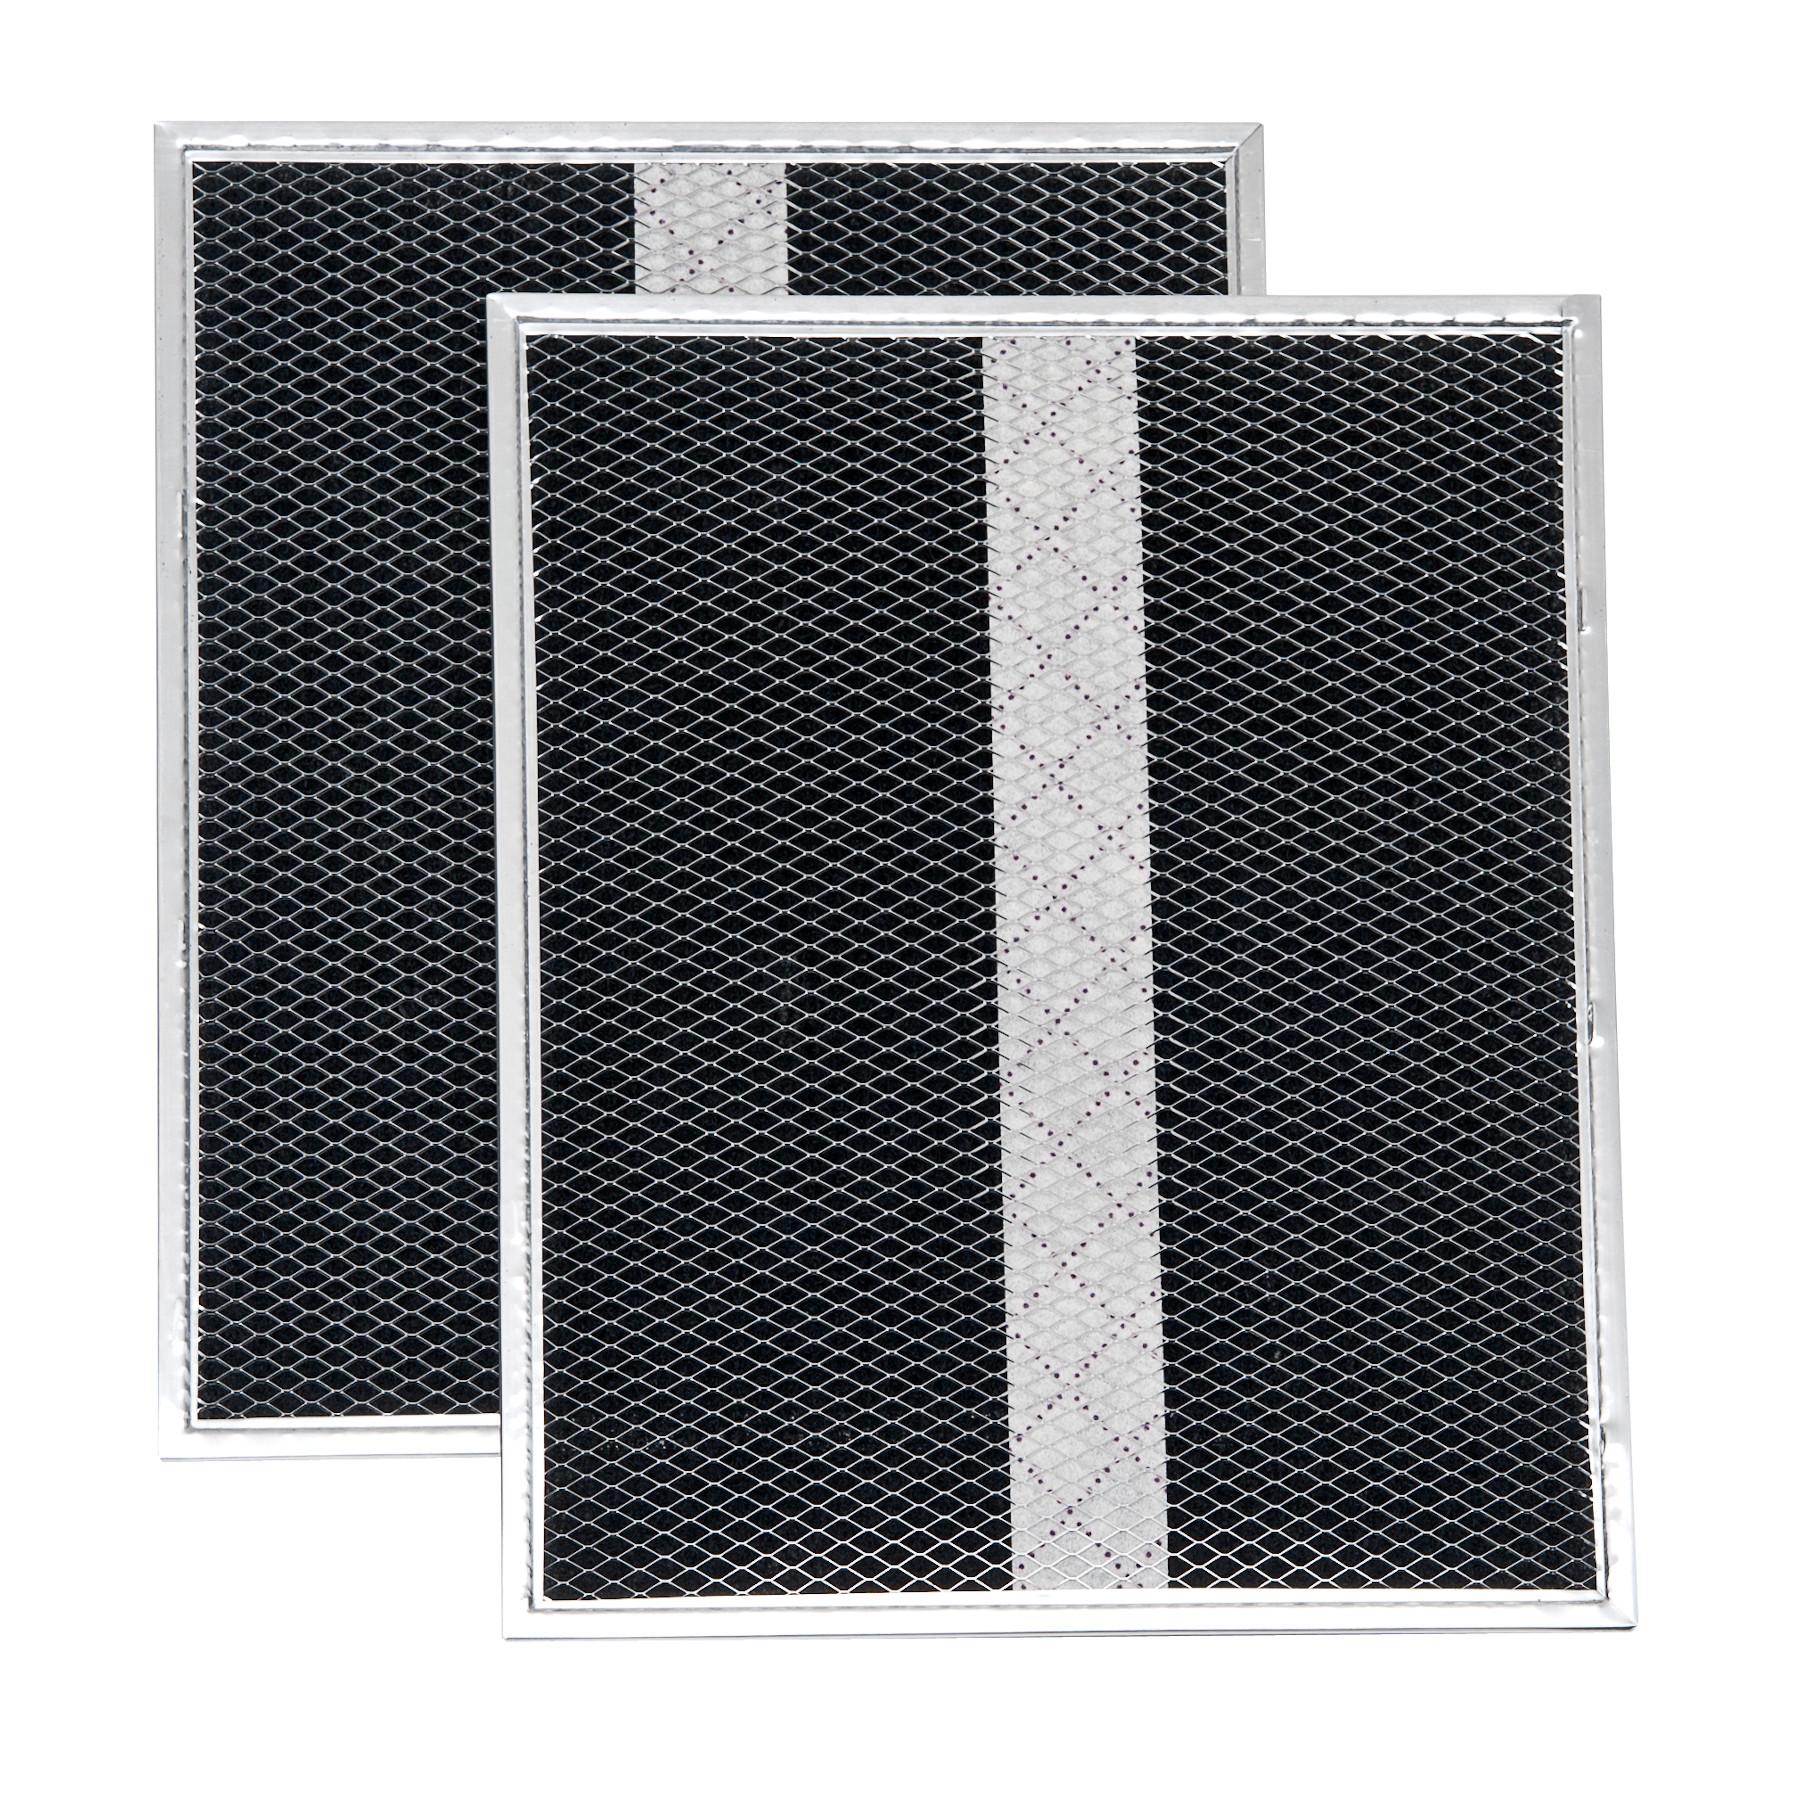 American Metal Carbon Range Hood Filter 10 7//16 x 11 7//16 x 3//8